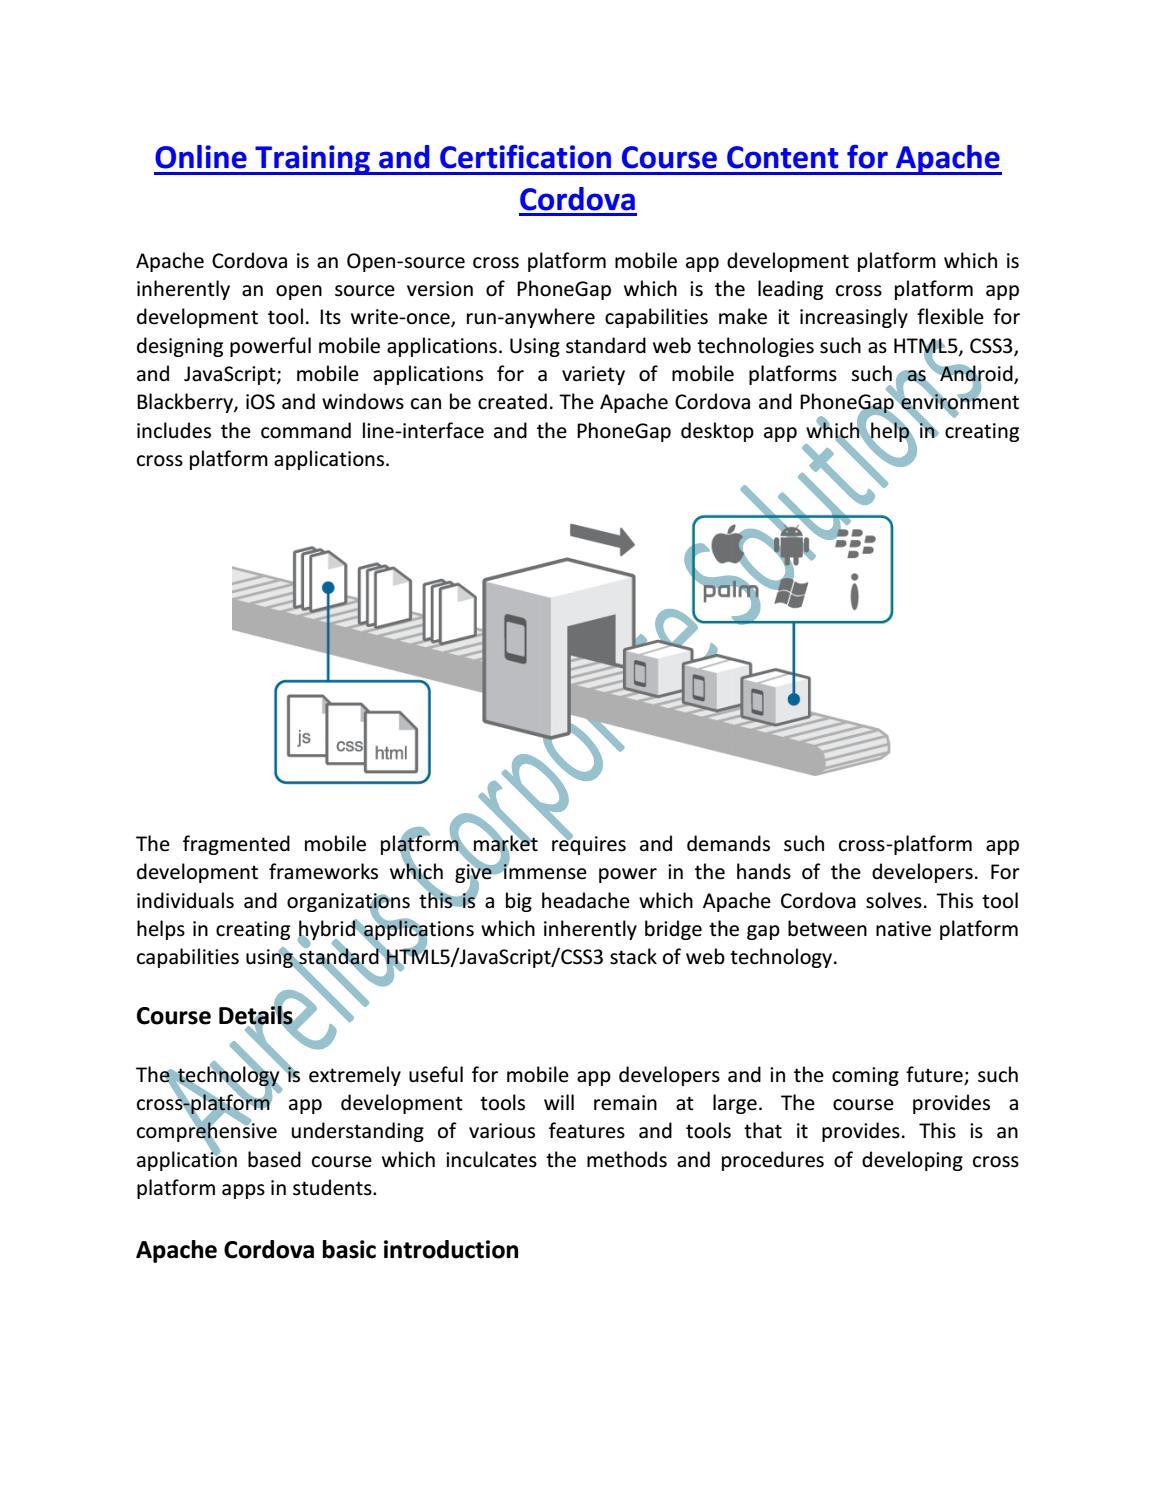 Apache Cordova Online Training Course in Delhi/NCR by